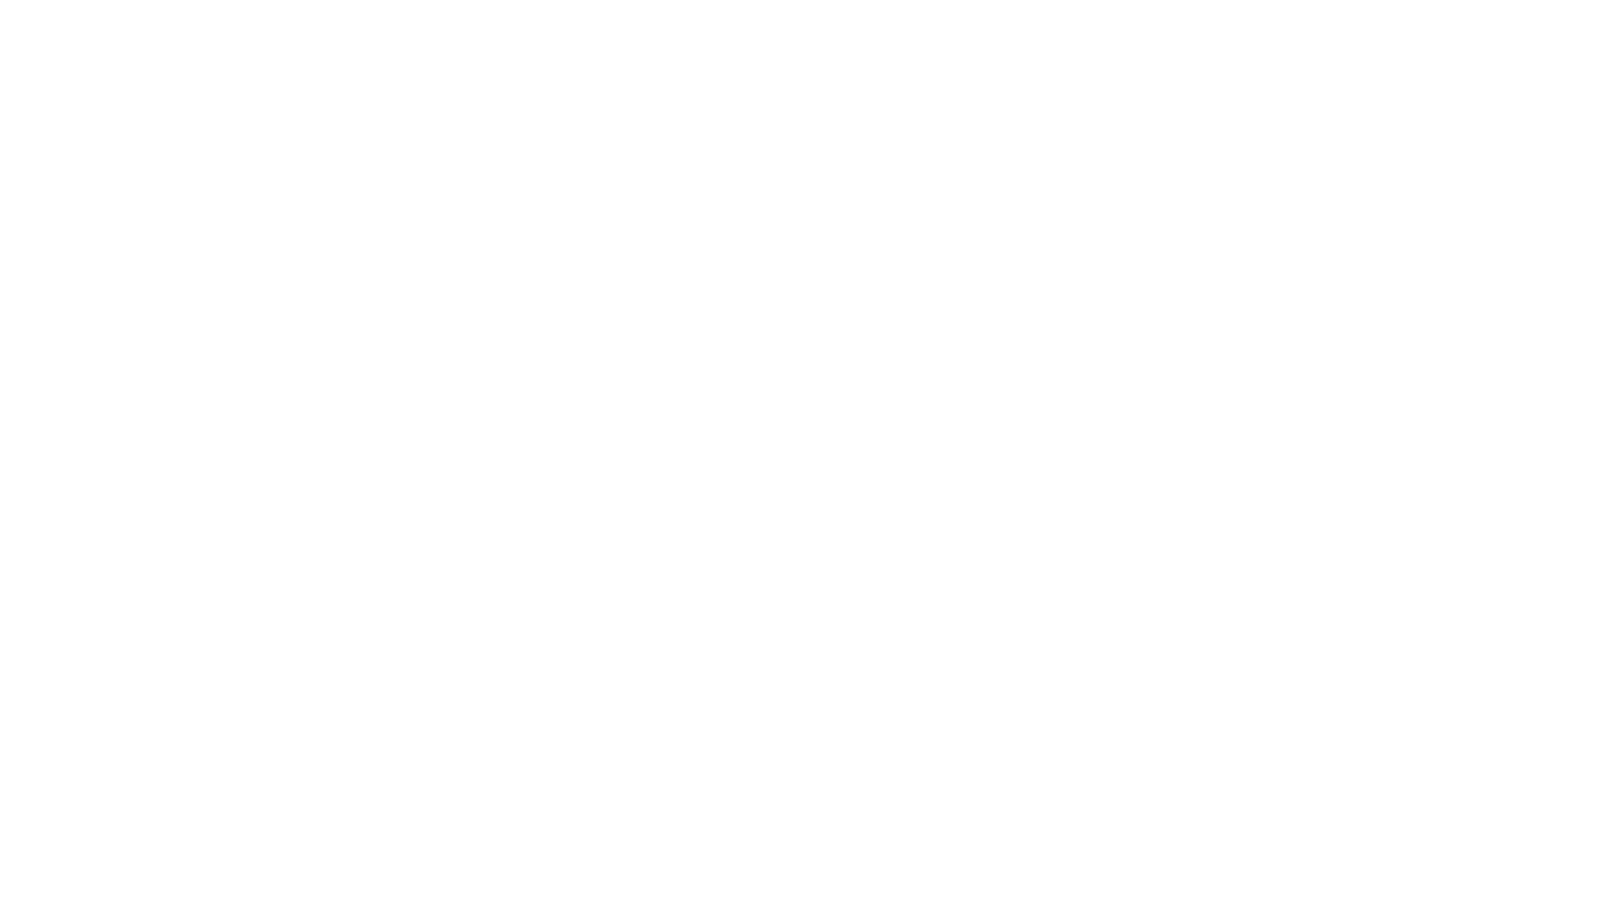 #SobatYBHK, Podcast #SuksesBersamaYBHK episode 4 topiknya Kerjasama, yang merupakan nilai ke-4 dari 7 Core Value Pendididikan di Persekolahan YBHK, berisi perbincangan antara Christian Eka Arisandi (Pengusaha Muda, Alumni SMP dan SMA Vianney, owner Ekaceluller) dengan Alvina Giovanni (siswi Kelas 12 IPS SMA Vianney). #kerjasama #podcast #smpvianney #smavianney #alumni #smpkatolik #smakatolik #ybhk #yayasanbundahatikudus #sekolahtarsisius1 #sekolahtarsisius2 #sekolahtarsisiusvireta #sekolahdamai #sekolahvianney #sekolahkatolik #ppdb2022 #yayasanpendidikan